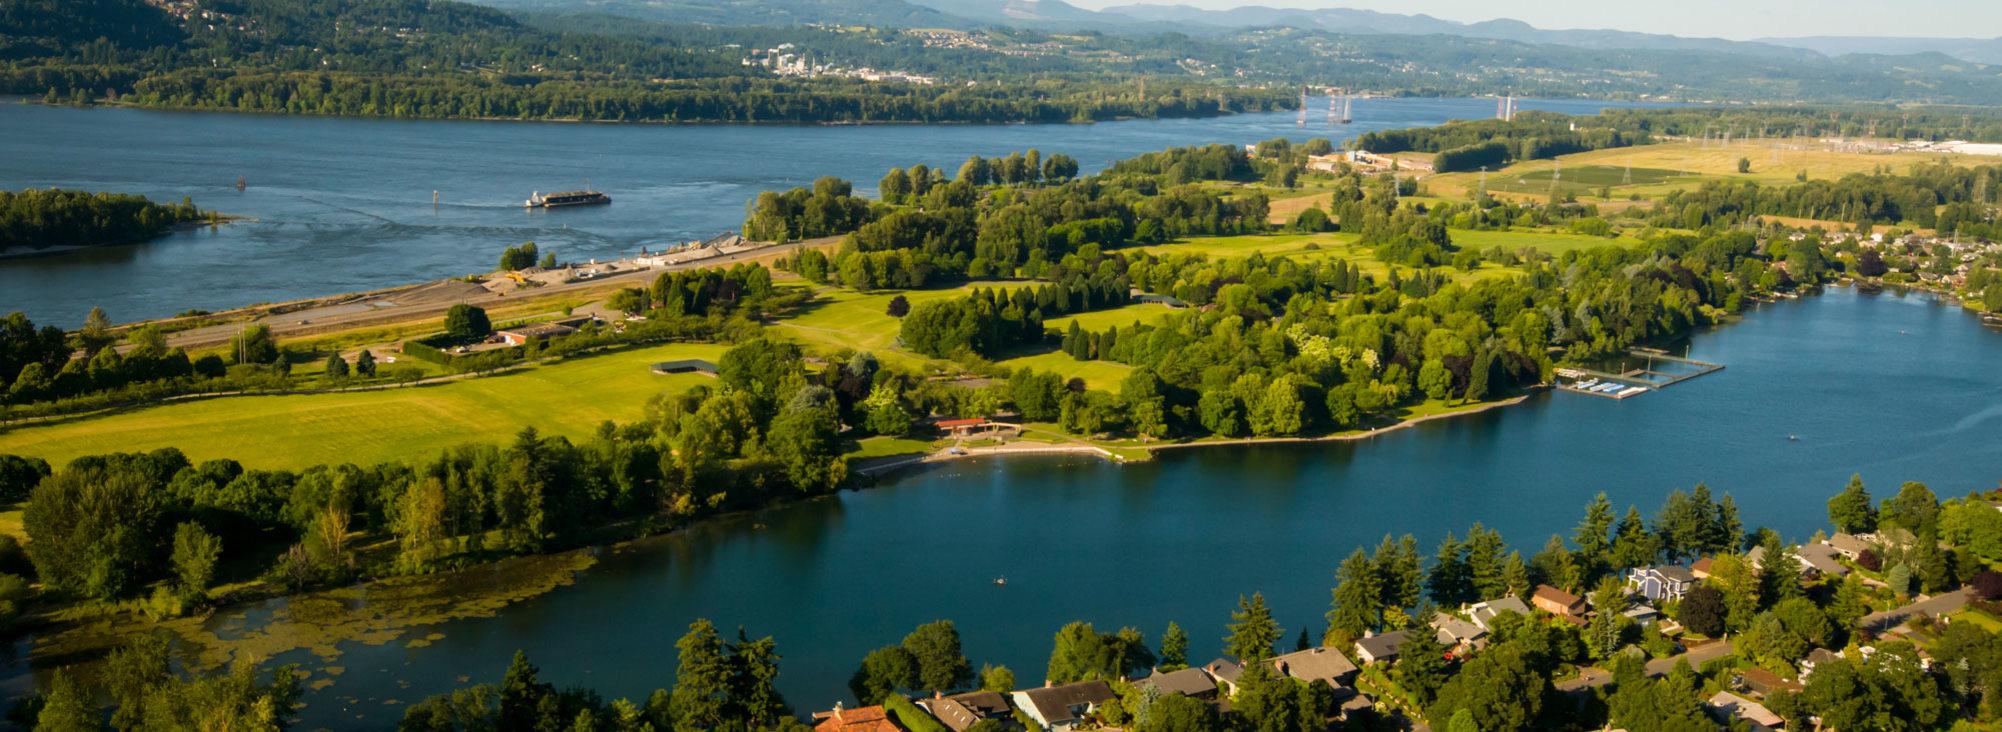 aerial photo of Blue Lake Regional Park